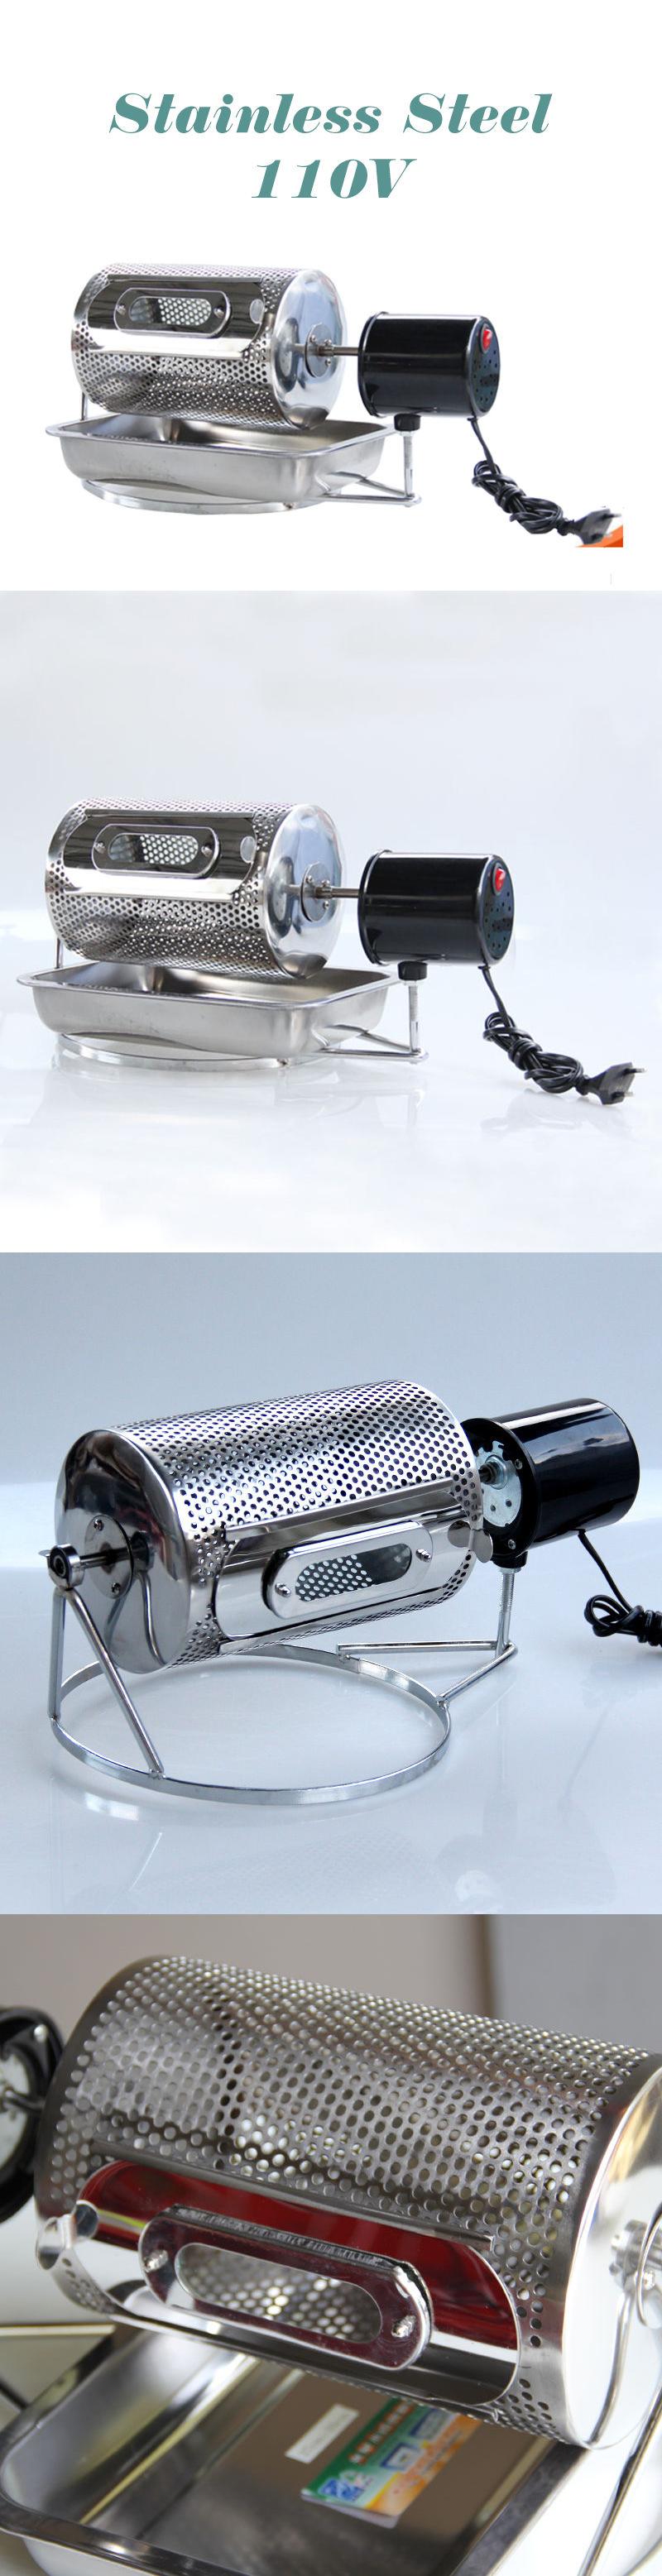 110V Home Kitchen Coffee Roaster coffee bean Machine Stainless Steel